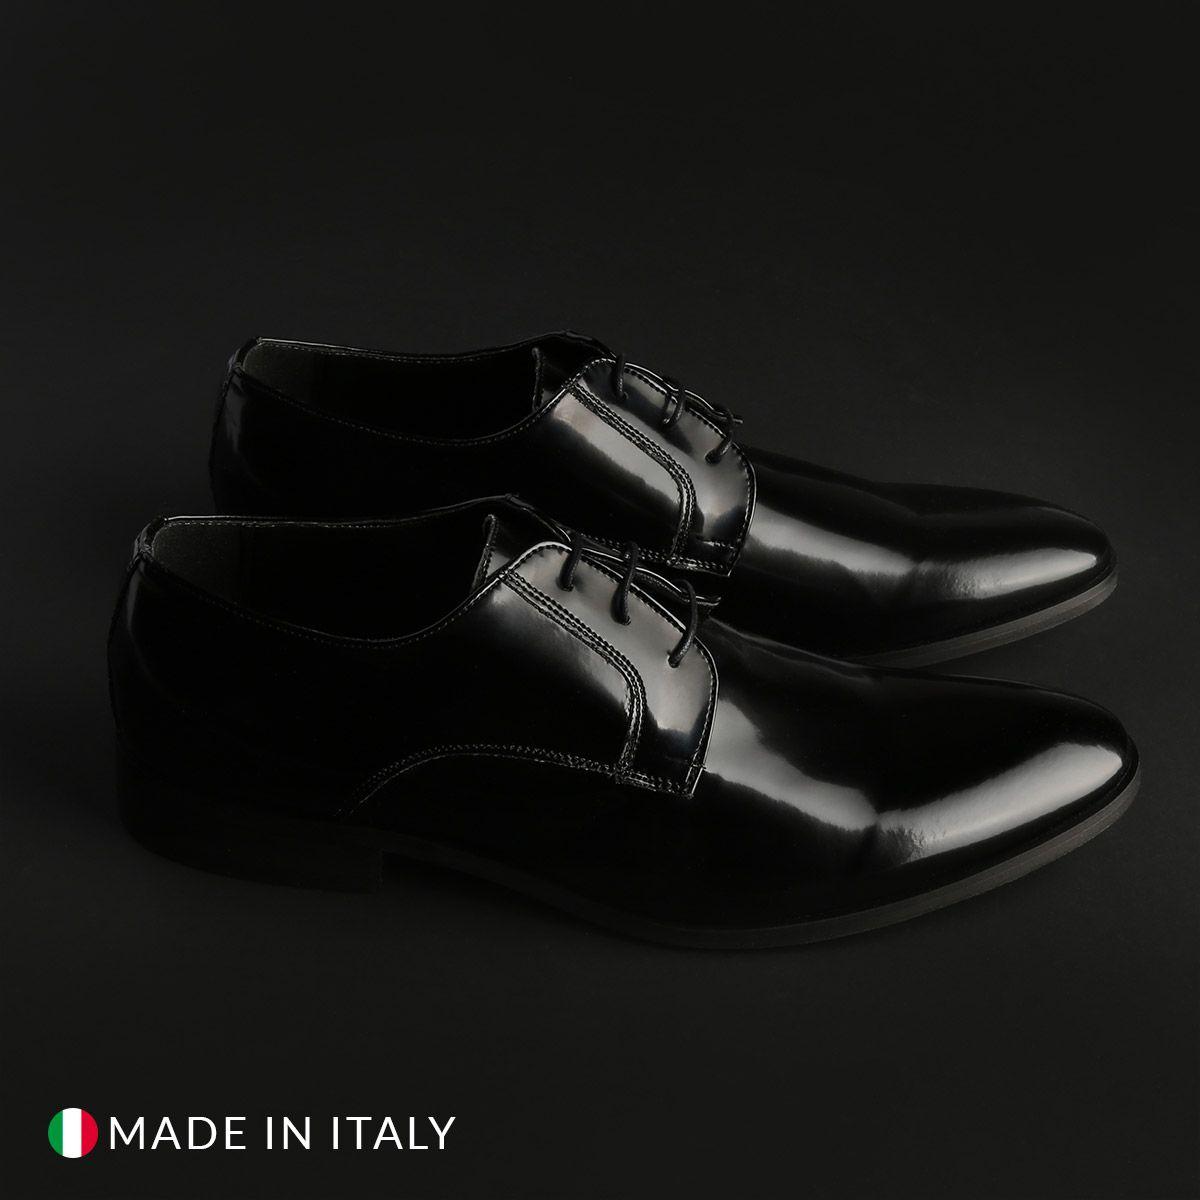 Schnürschuhe Made in Italia – JOACHIM